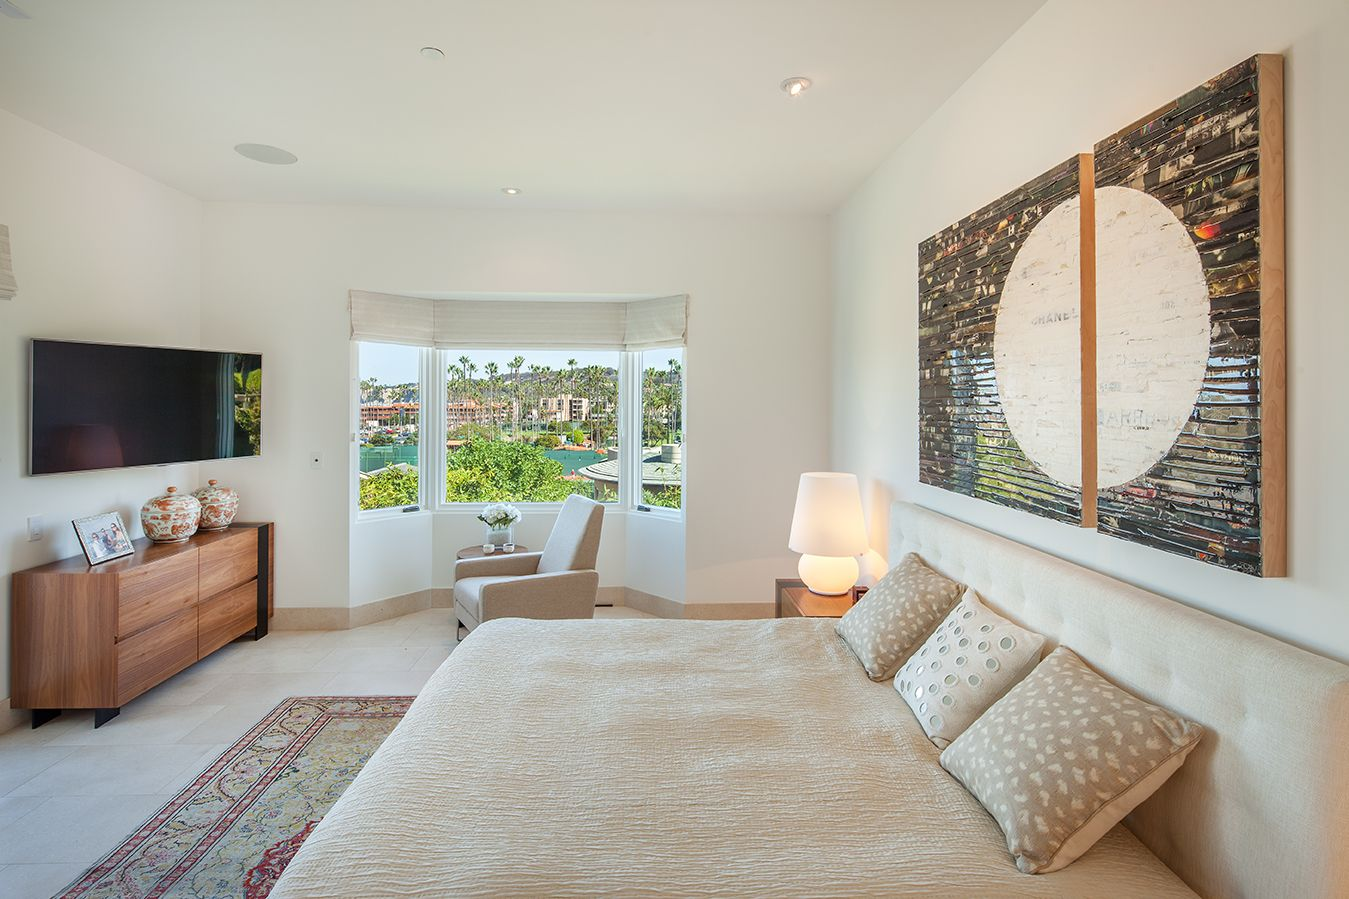 Hill Construction Company La Jolla - San Diego Custom Home - High ...